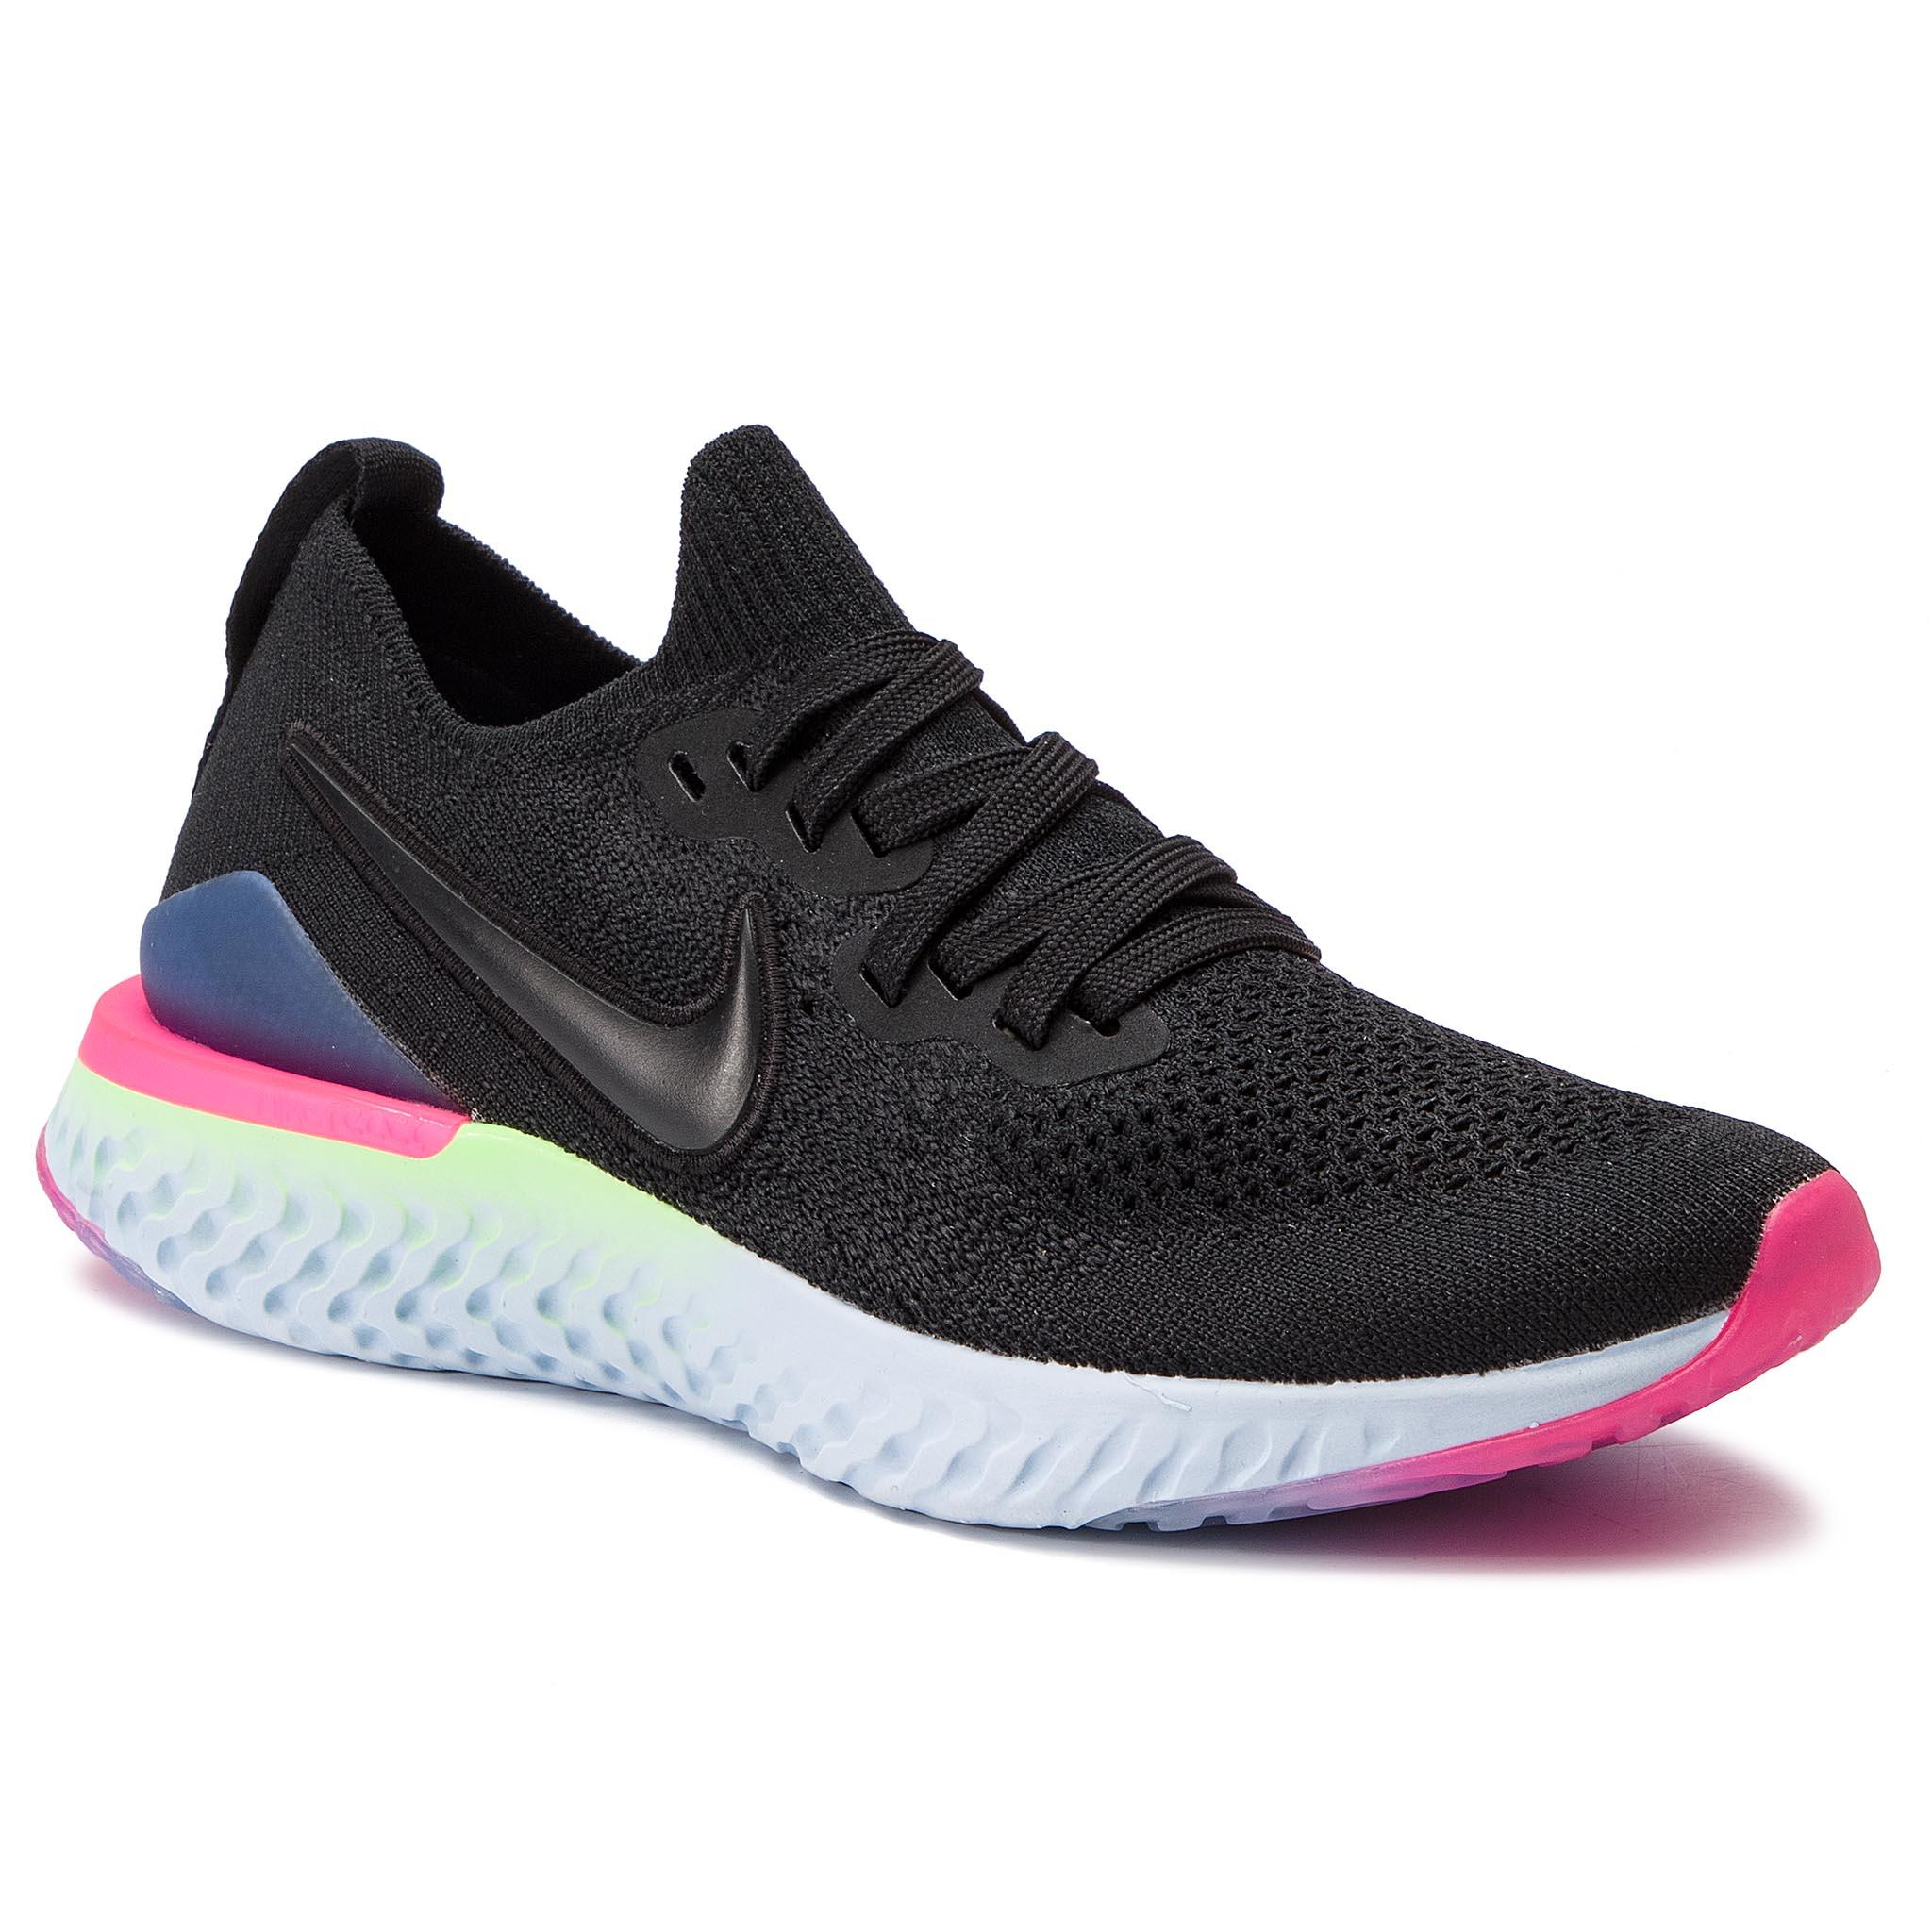 c7b04db738bc7 Shoes NIKE - Air Max 1 319986 034 Black White - Sneakers - Low shoes ...